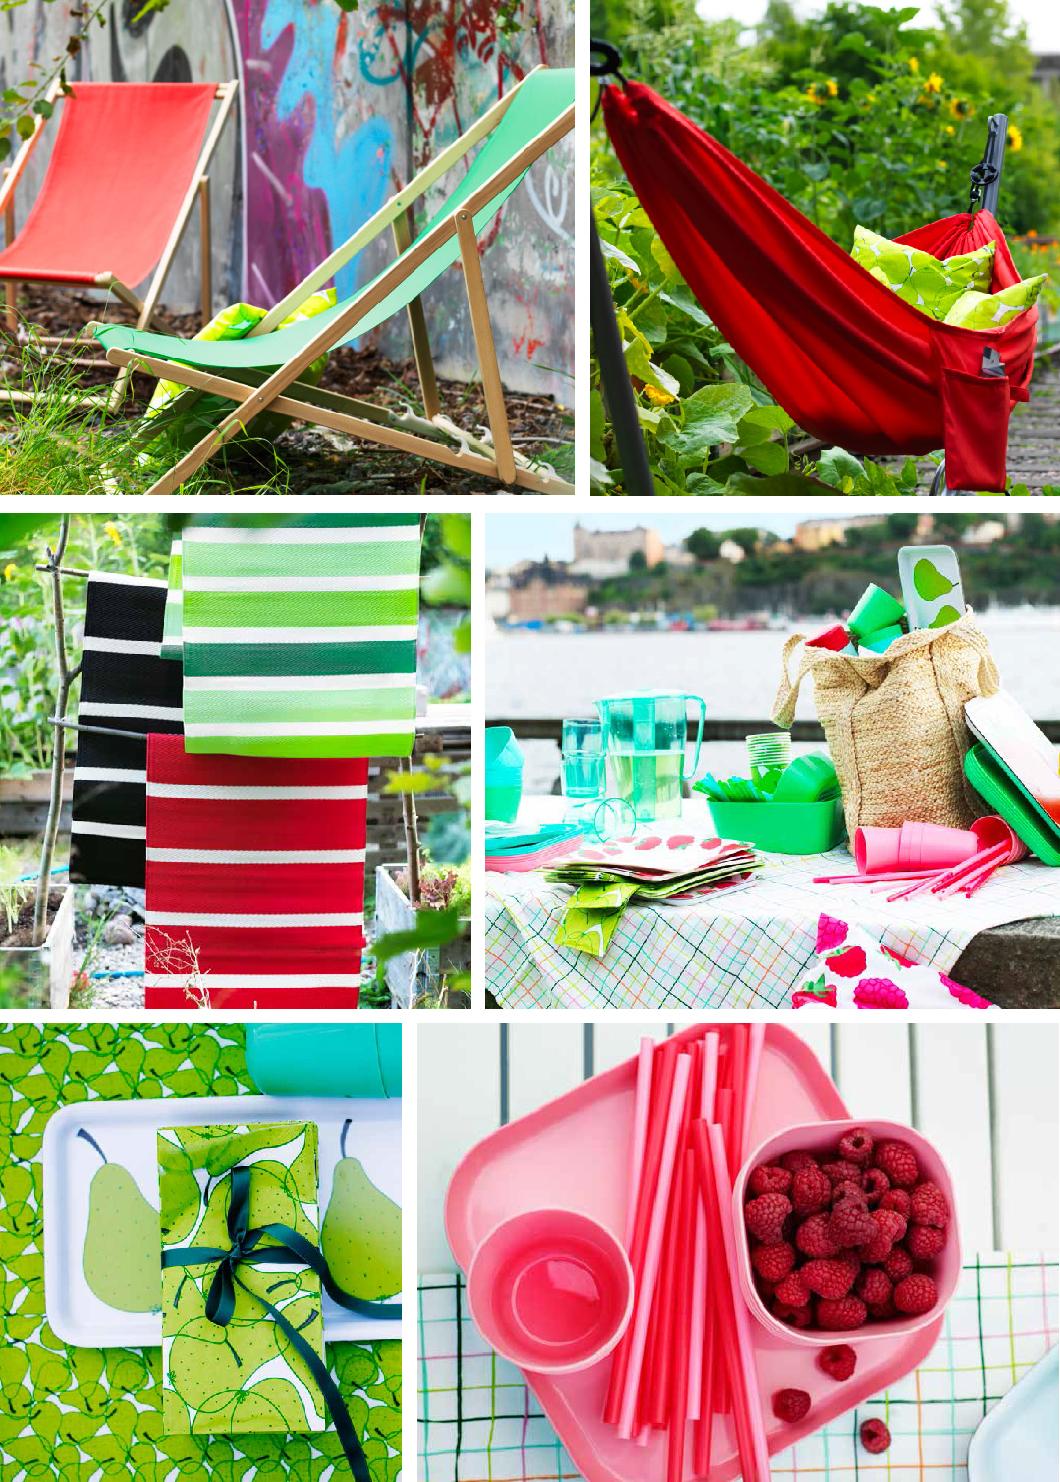 Ombrelloni da giardino ikea for Ikea mobili giardino